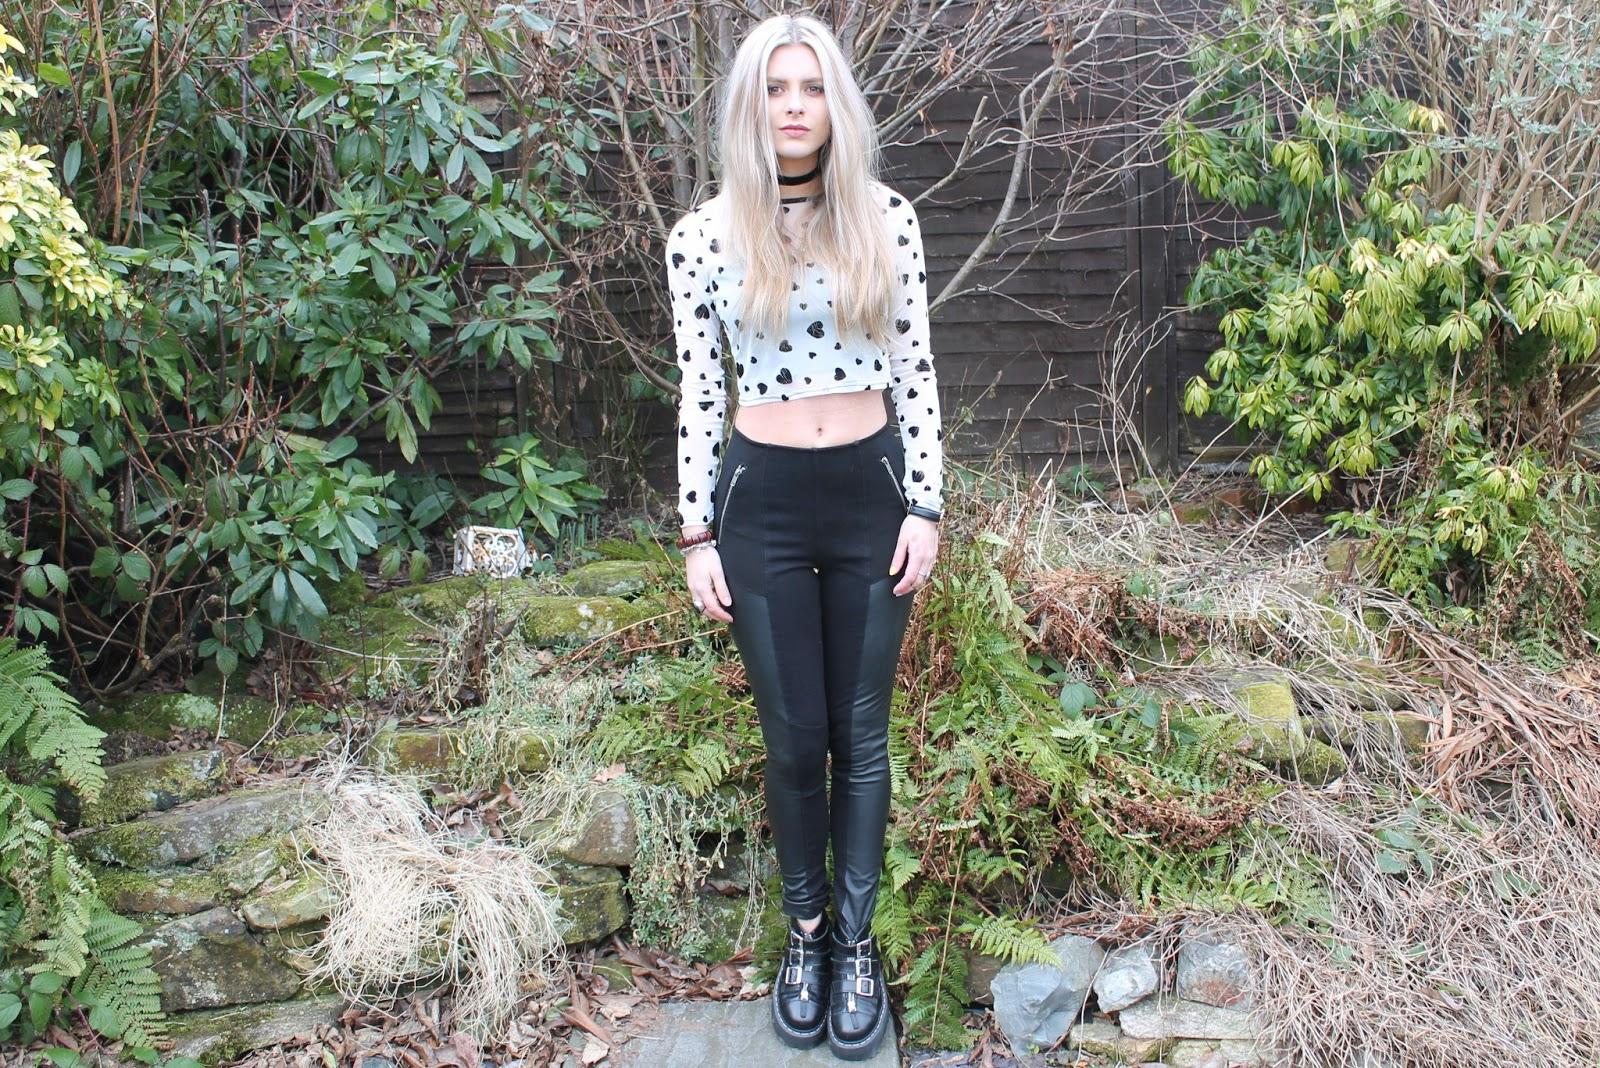 Blonde with leggins